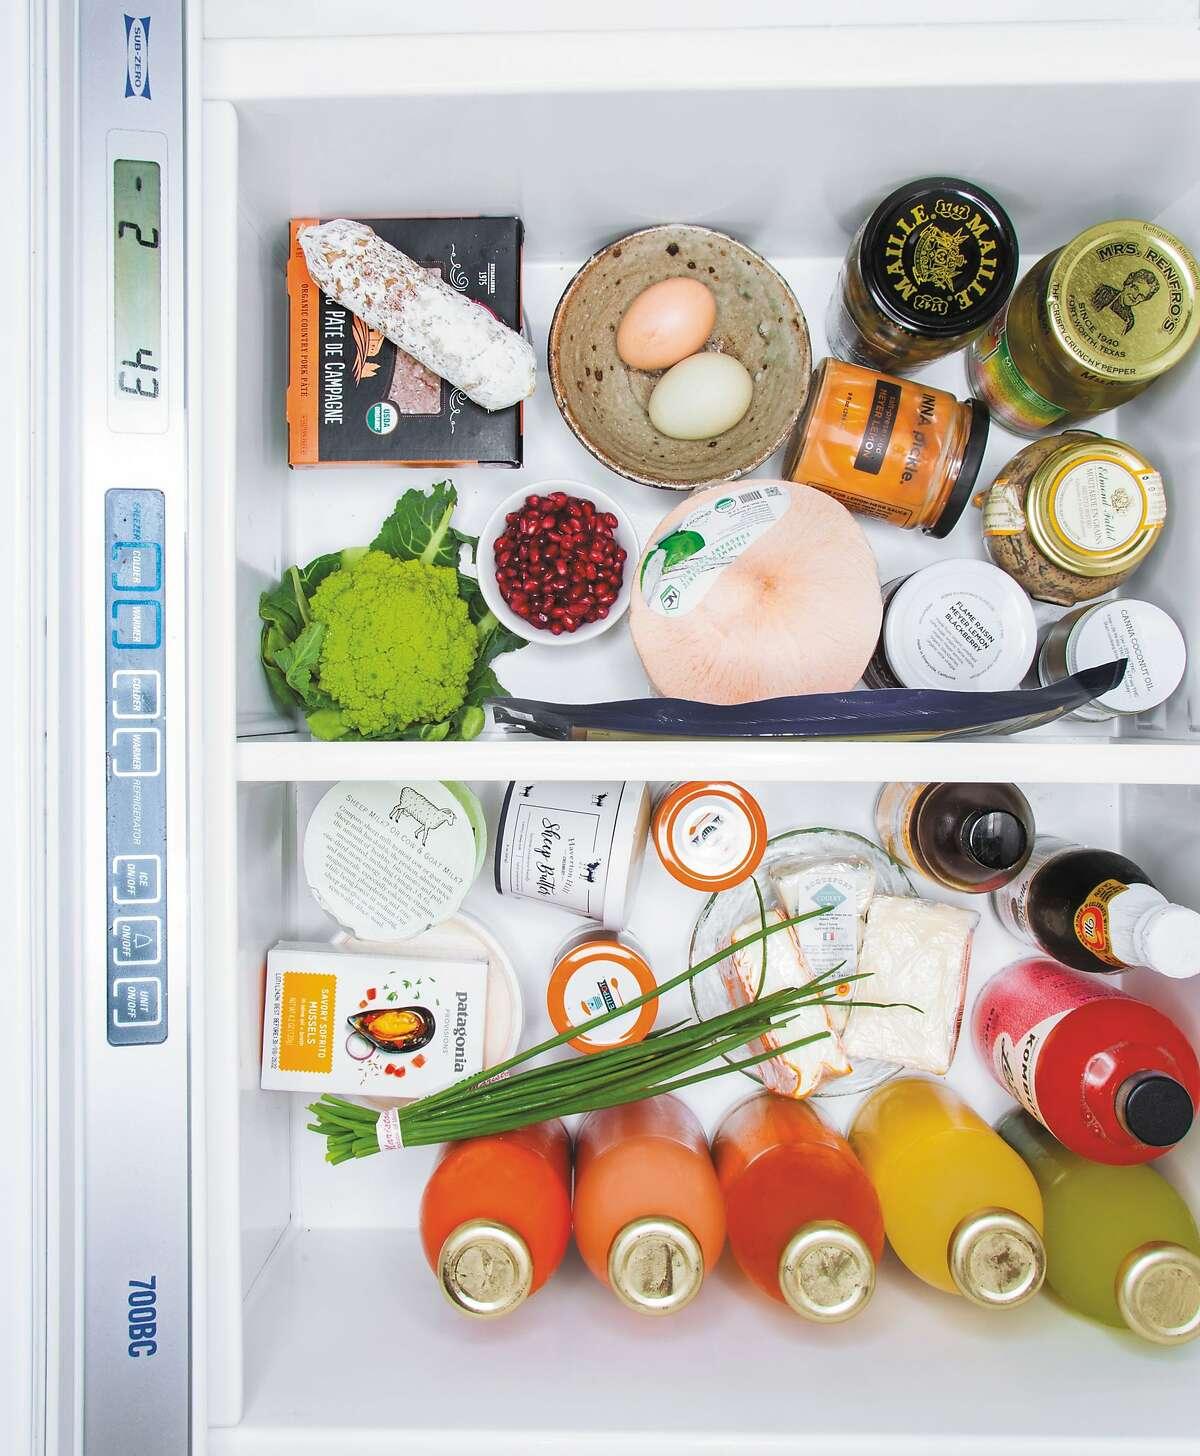 Dominique Crenn's fridge